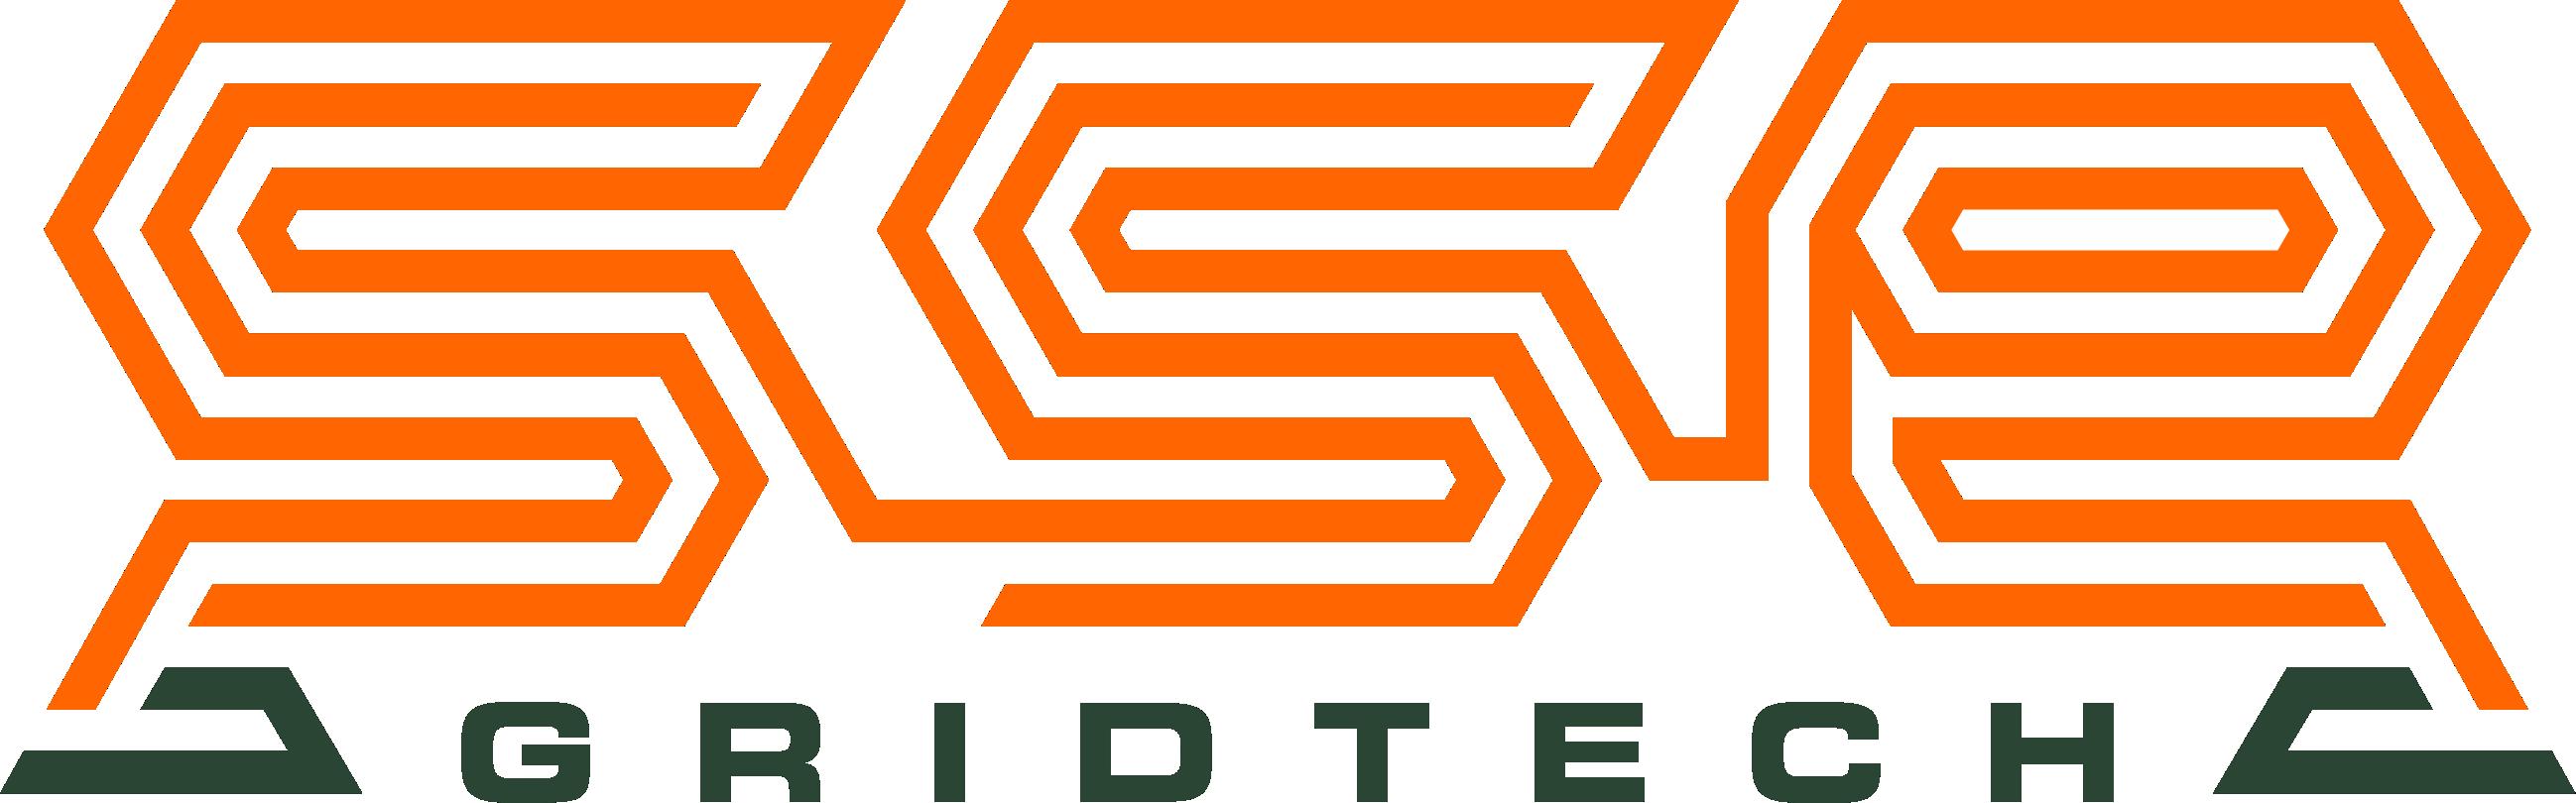 001_logo_sse_gridtech